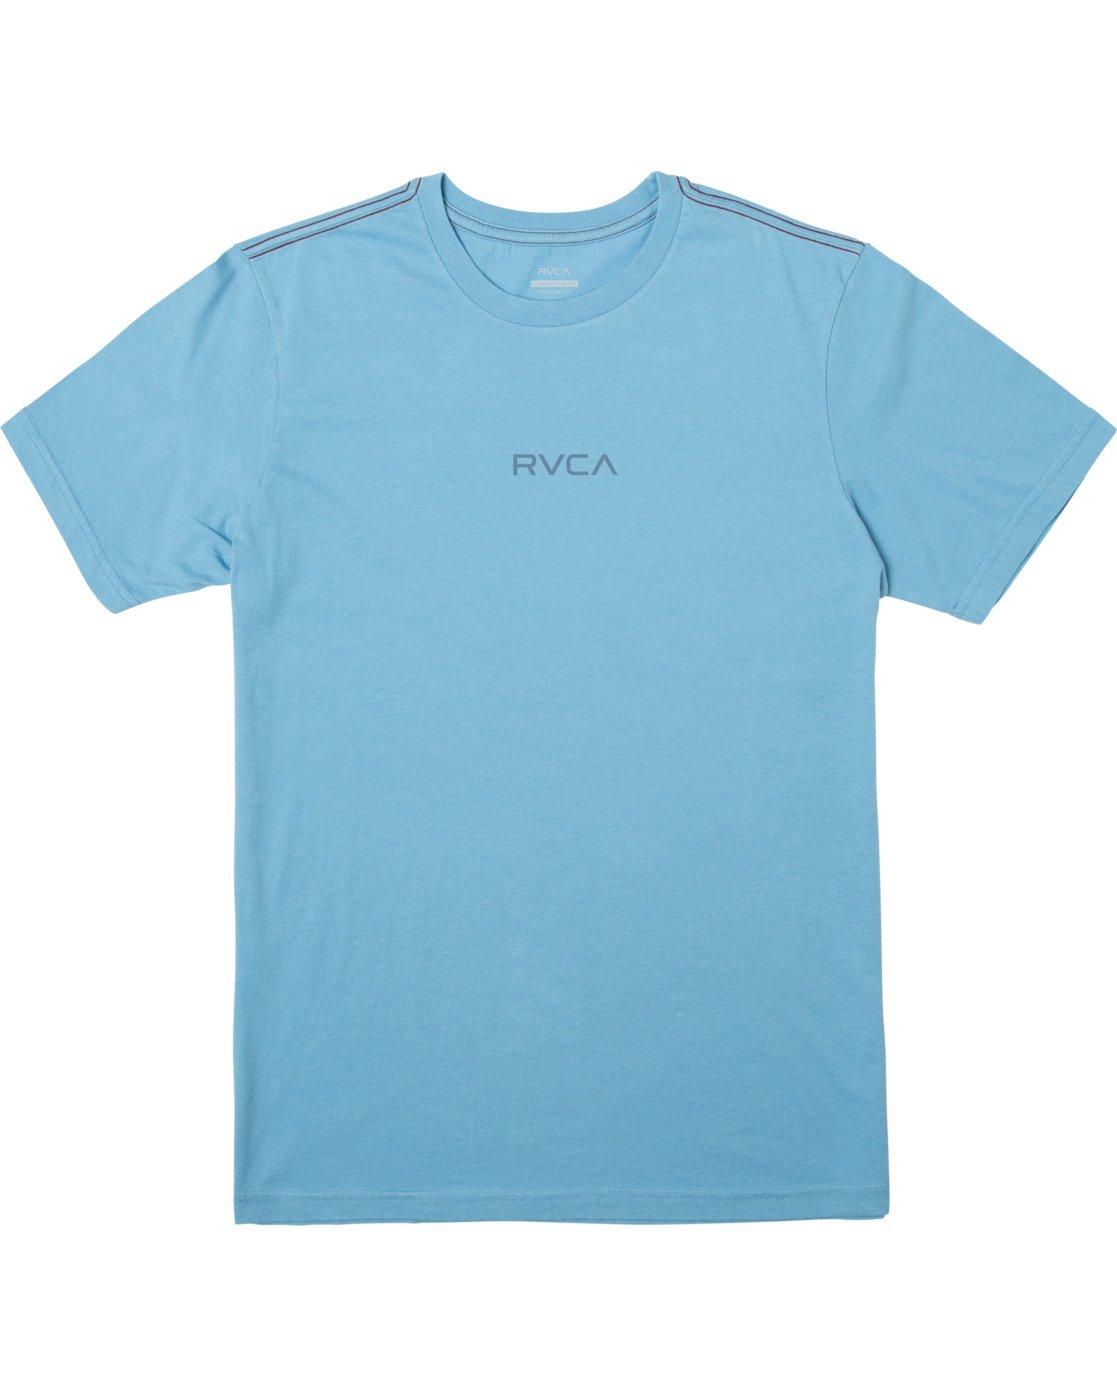 0 SMALL RVCA SHORT SLEEVE TEE Blue M430VRSM RVCA